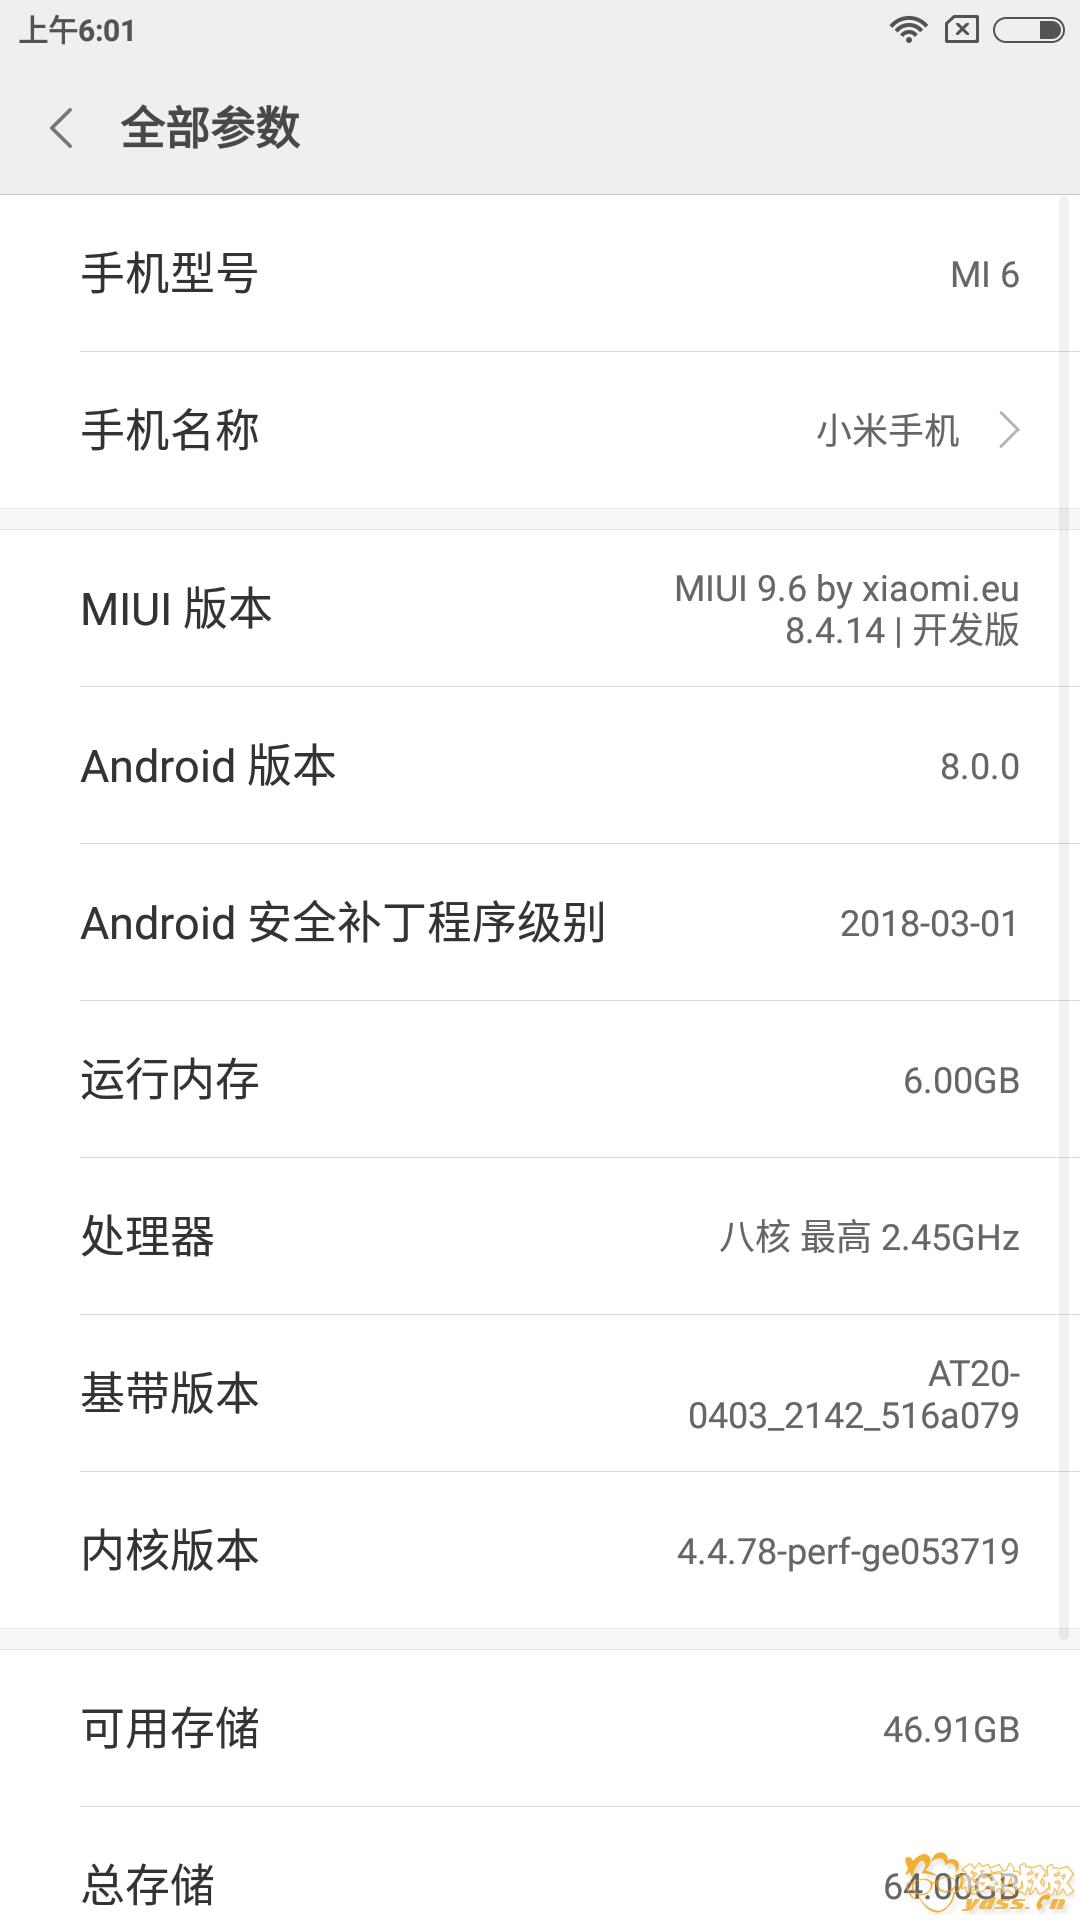 Screenshot_2018-04-15-06-01-48-221_com.android.se.png